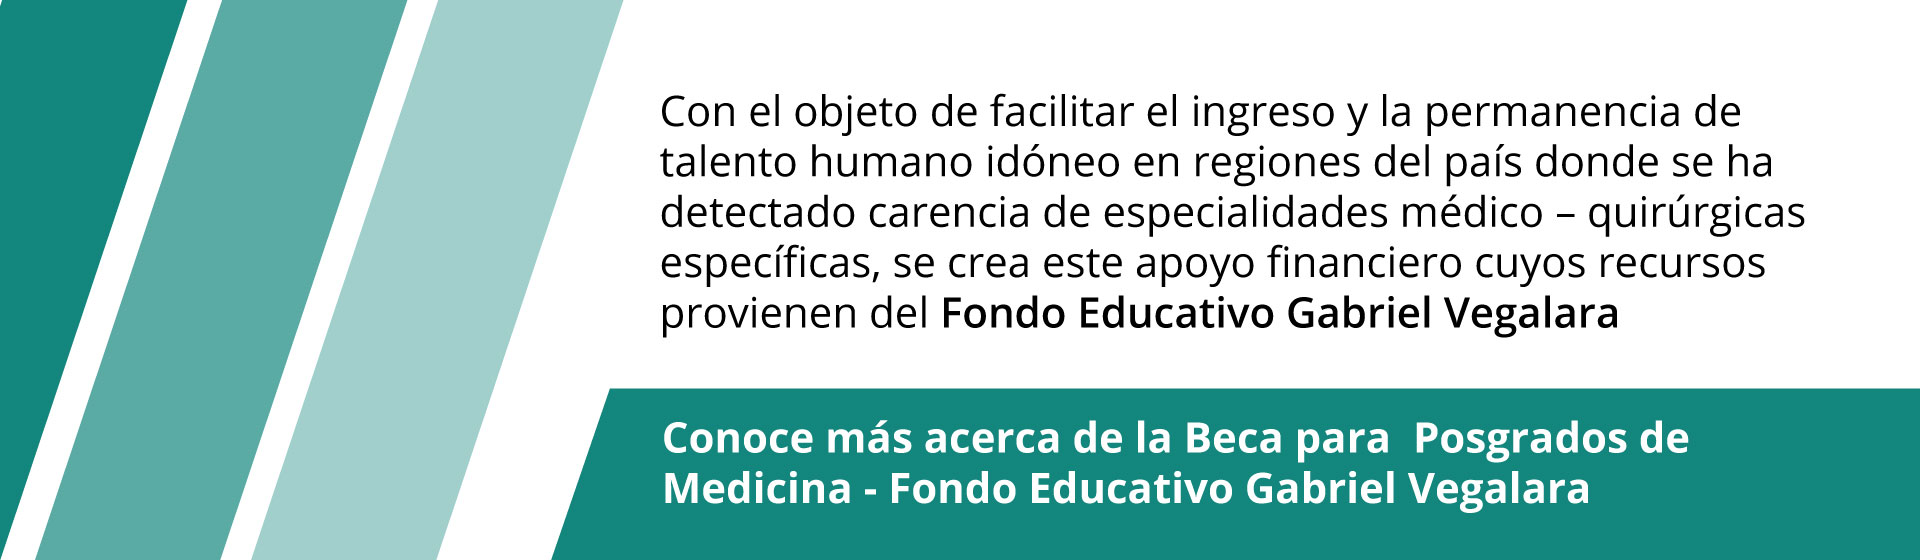 Beca posgrados en medicina - Fondo Gabriel Vegalara